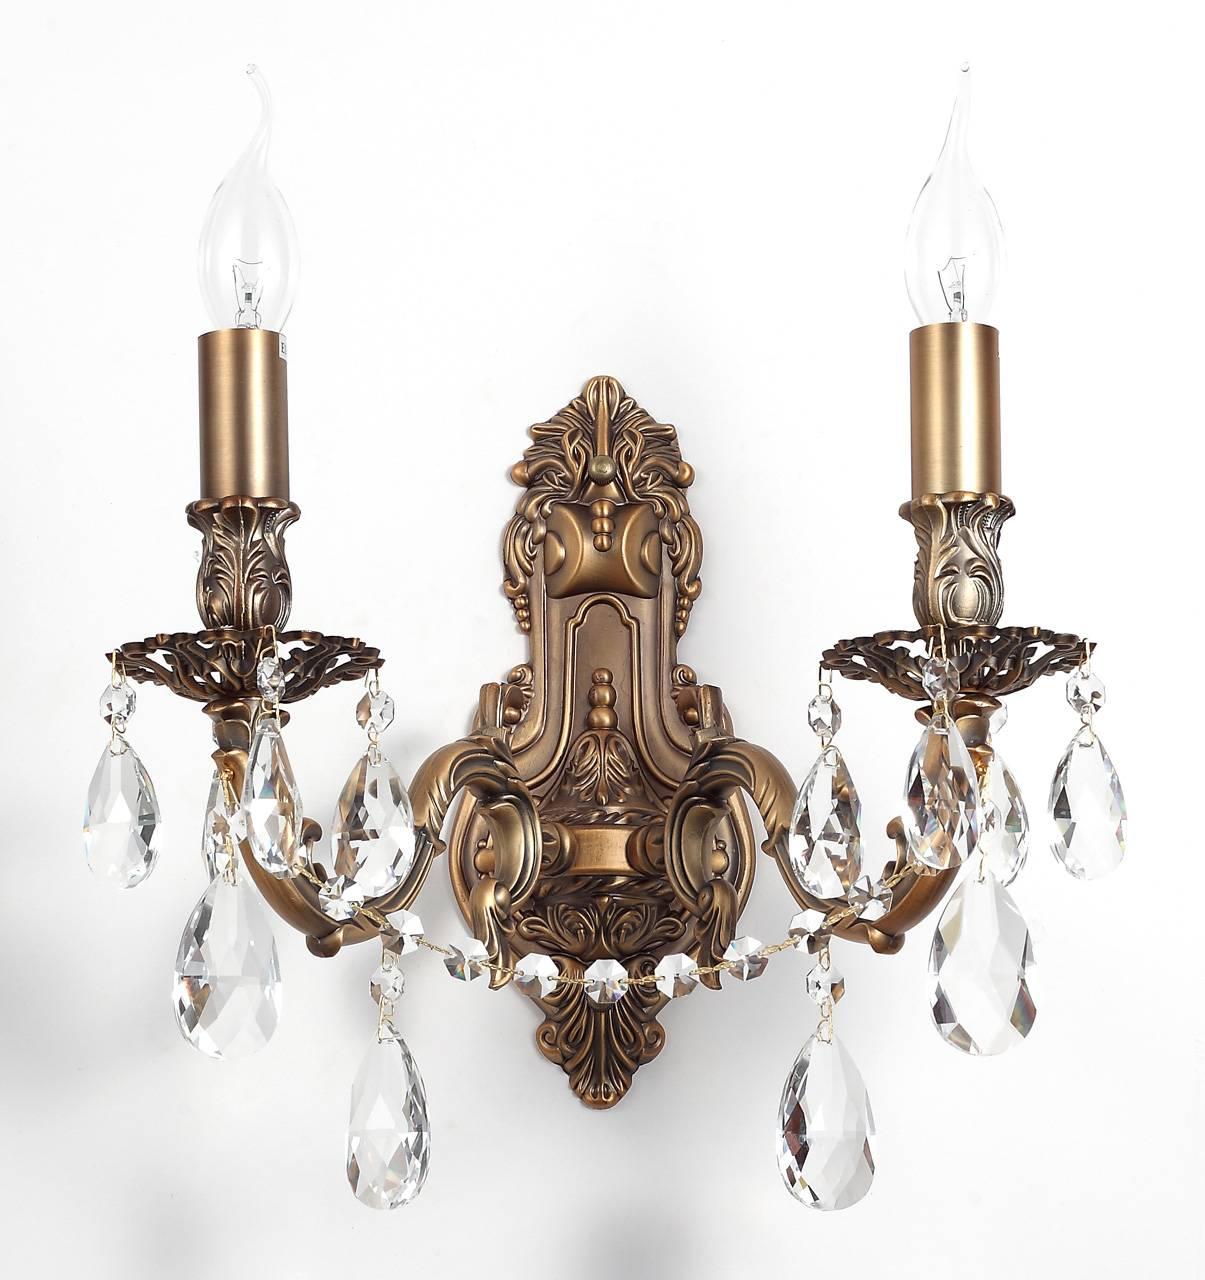 Бра Lucia Tucci Firenze W141.2 Antique цены онлайн